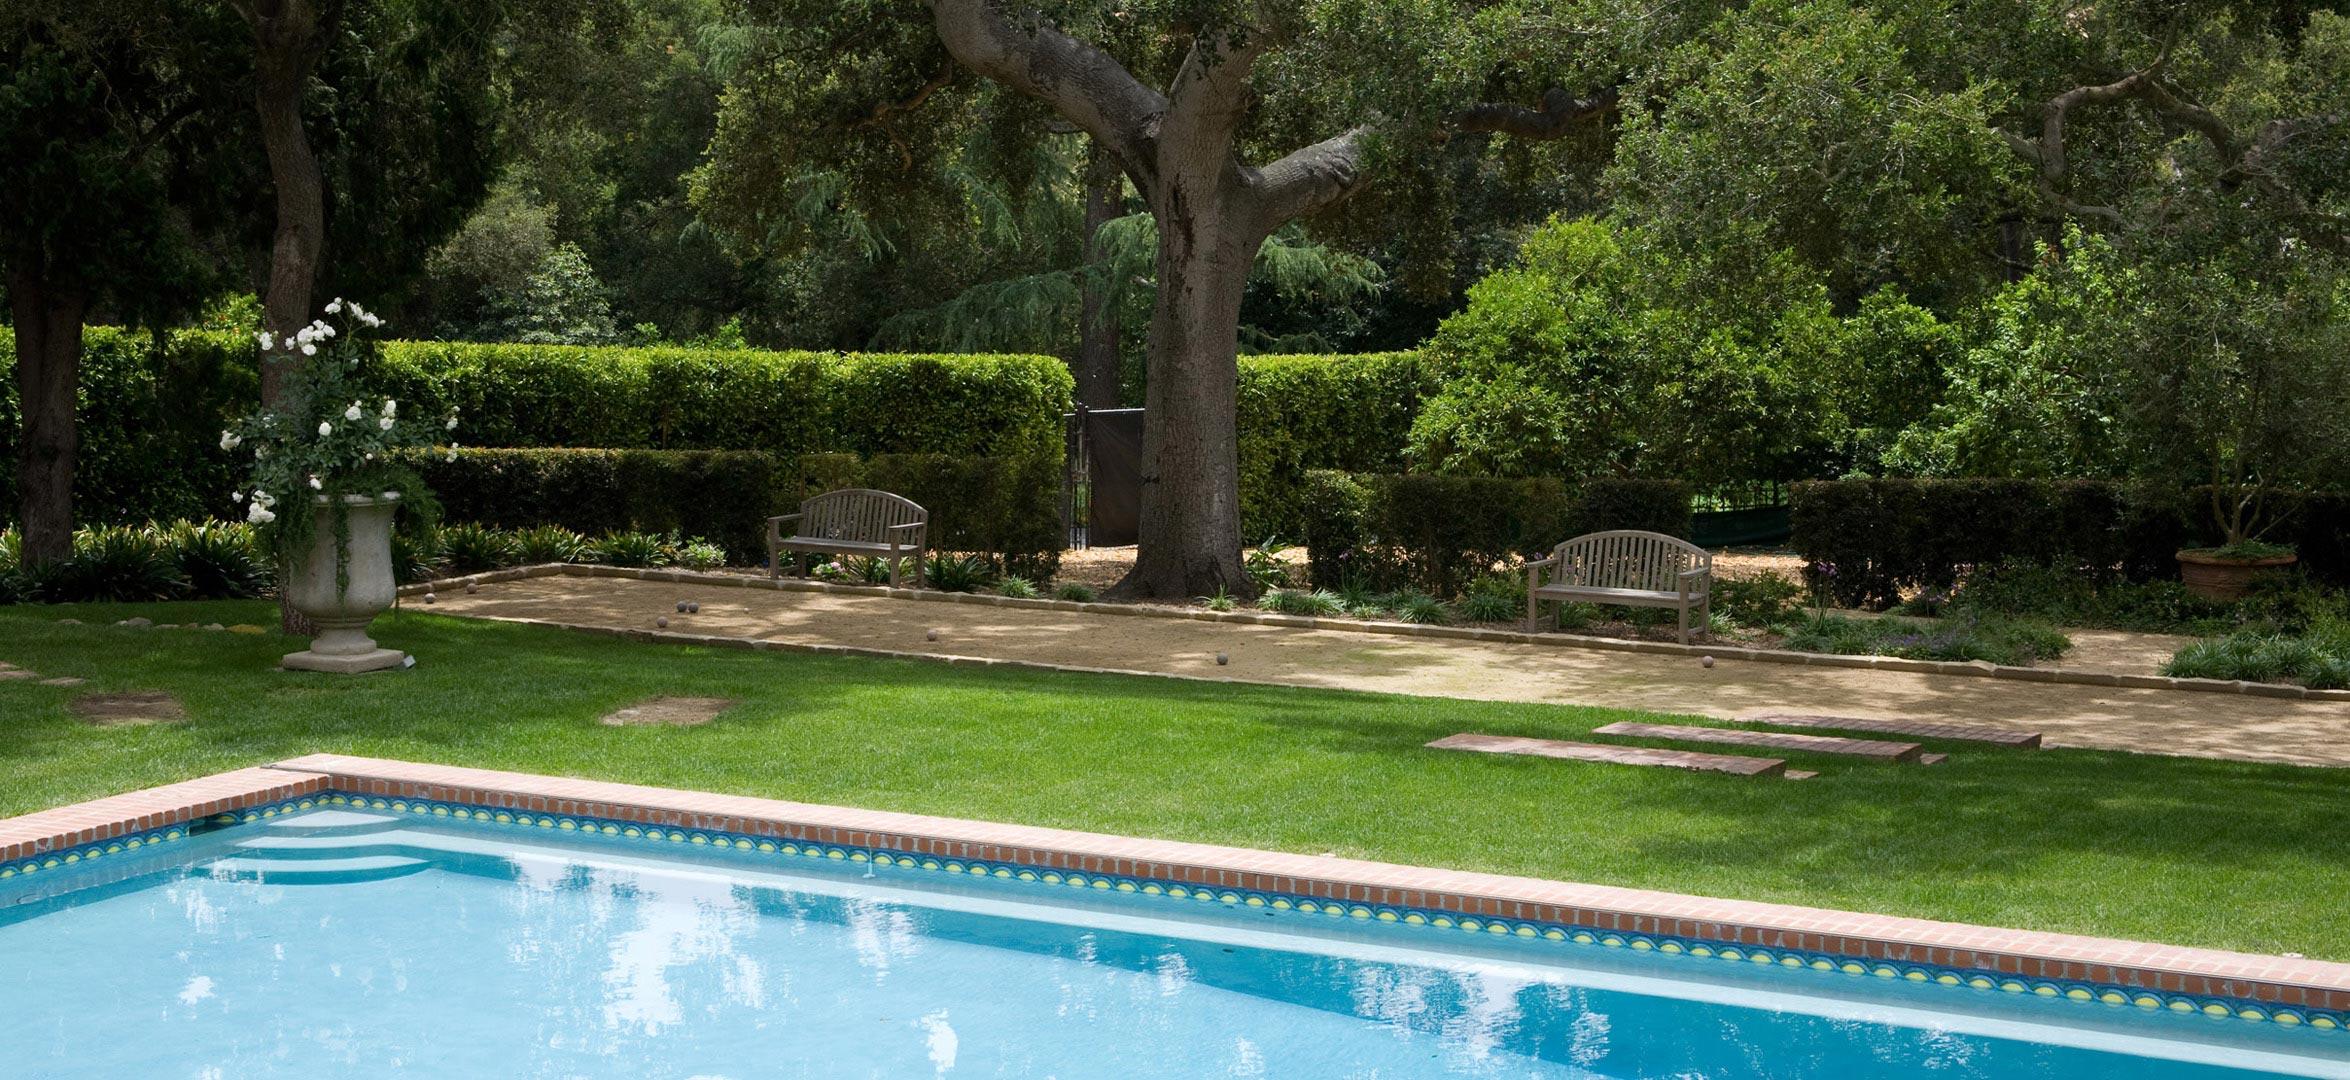 Montecito-08-pool-bocc-ball-court.jpg